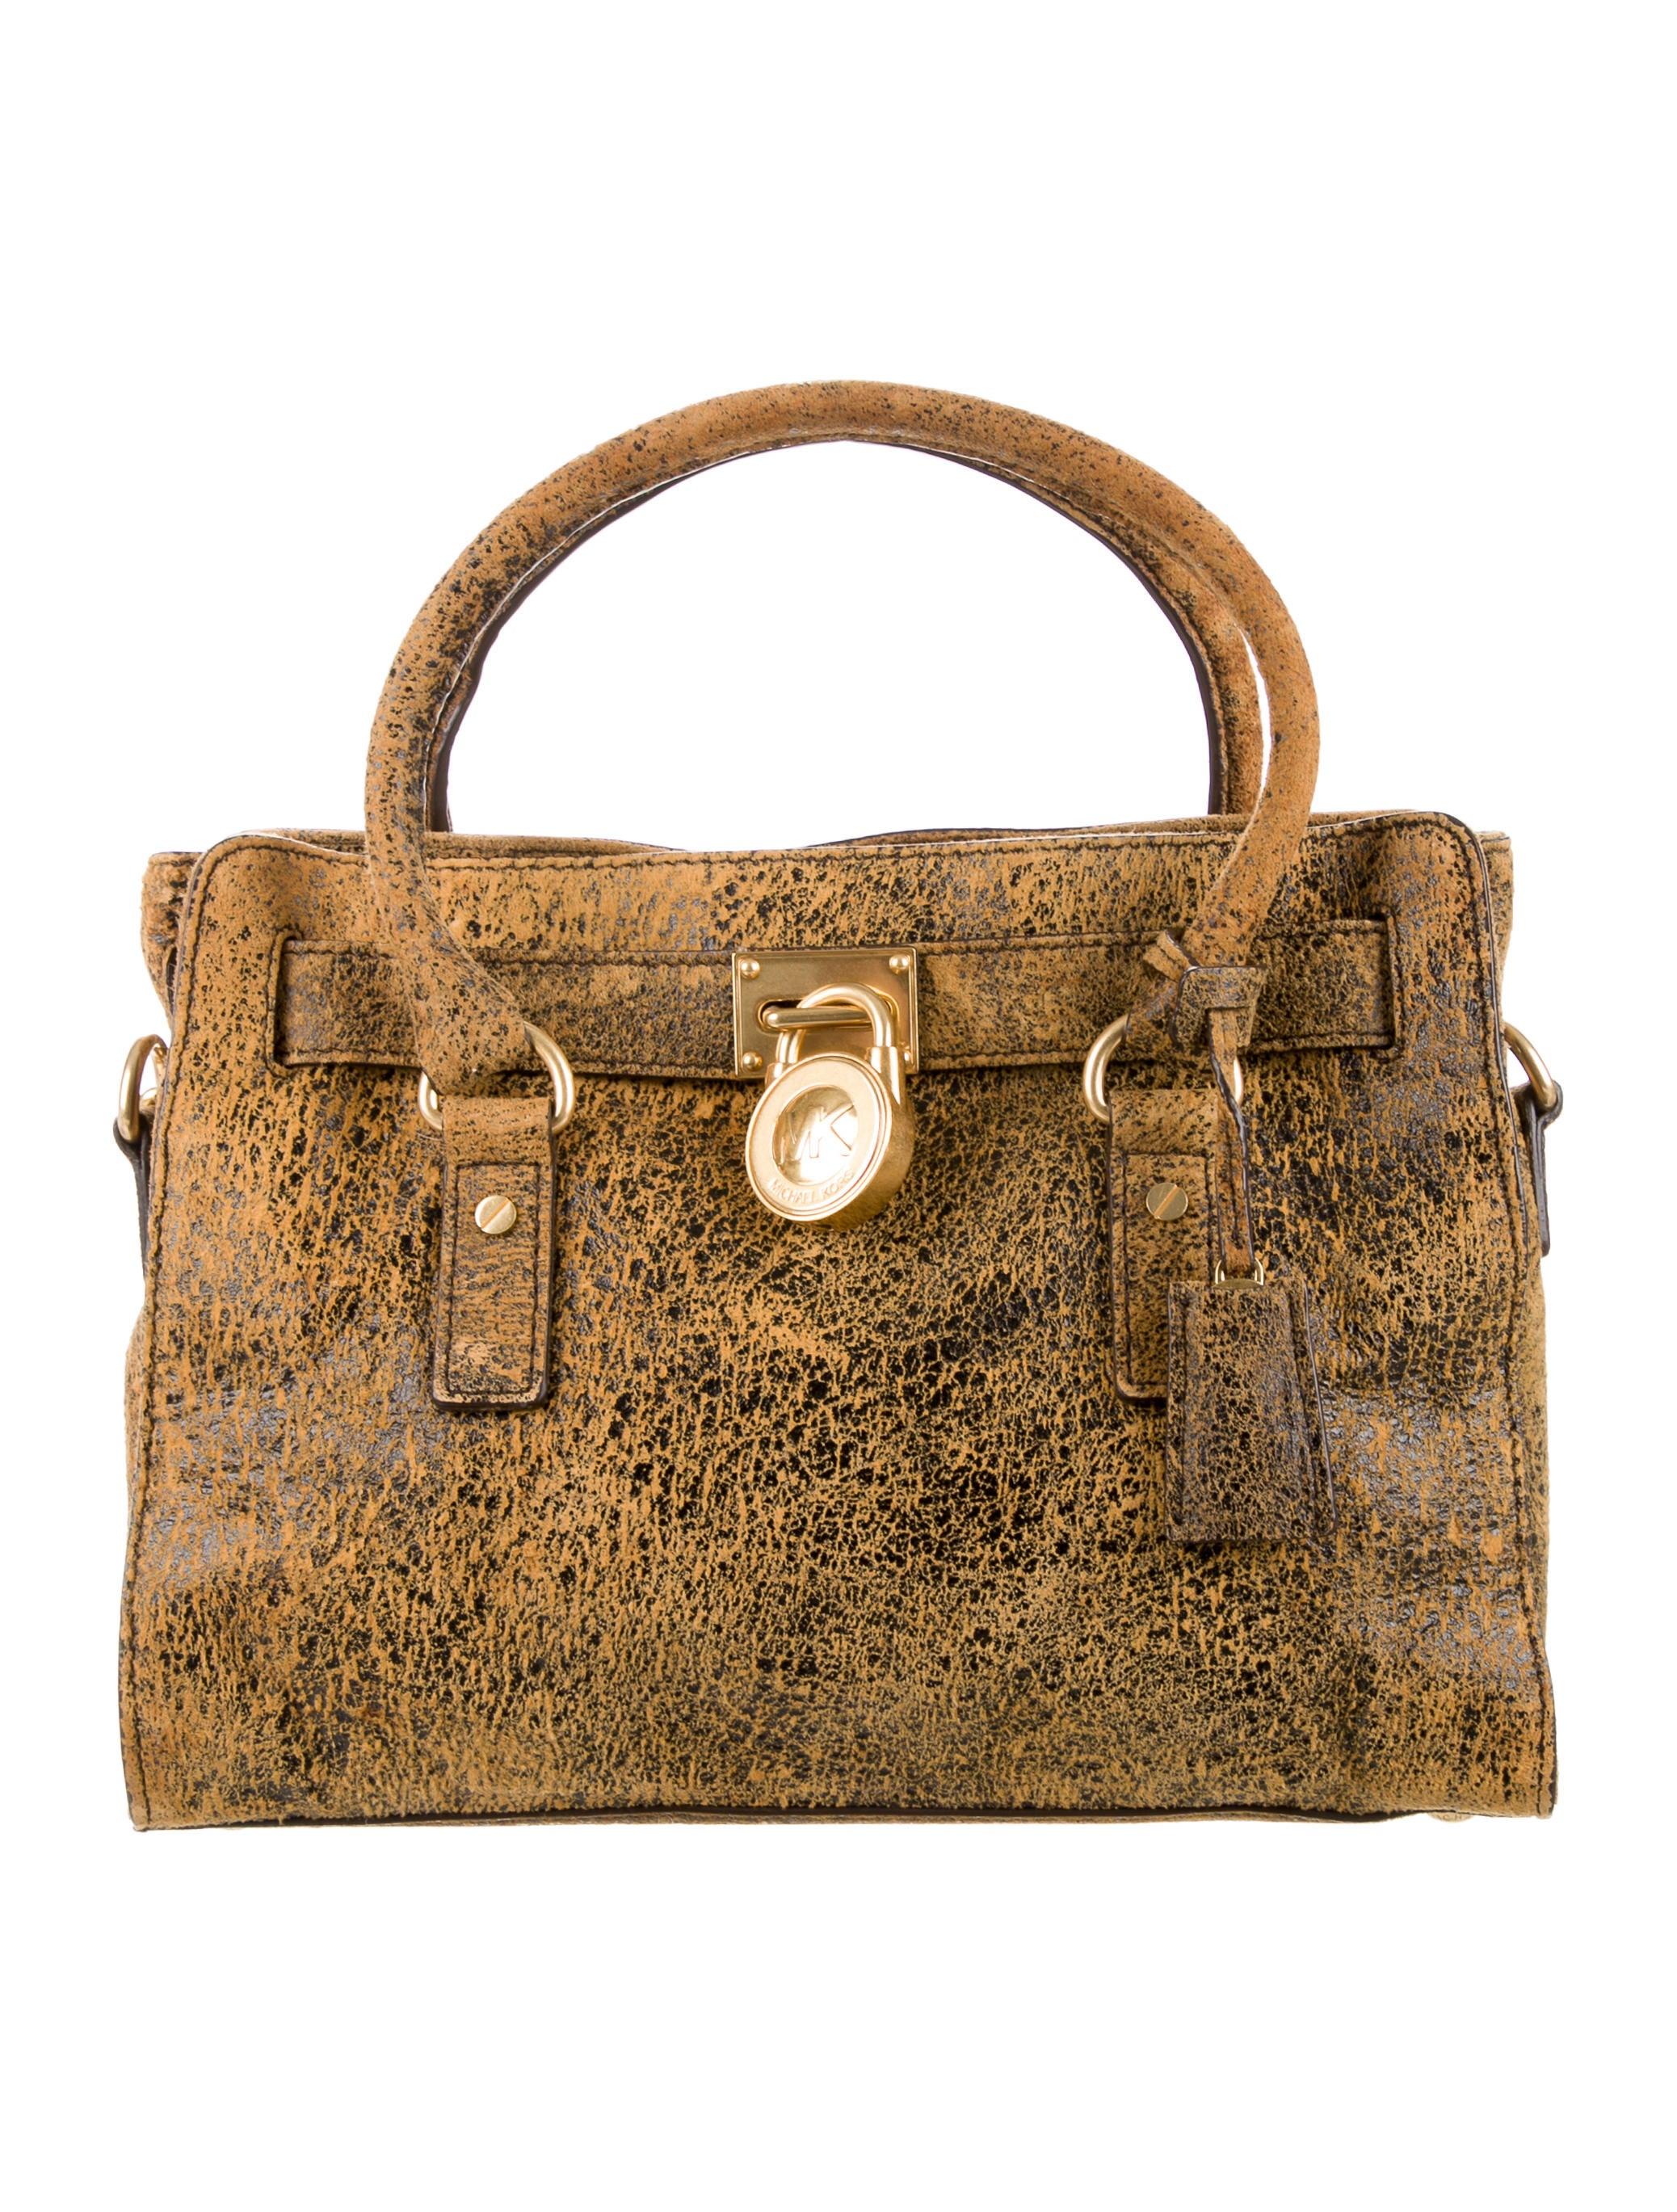 a1183d1fc278 Michael by Michael Kors Distressed Hamilton Tote - Handbags ...